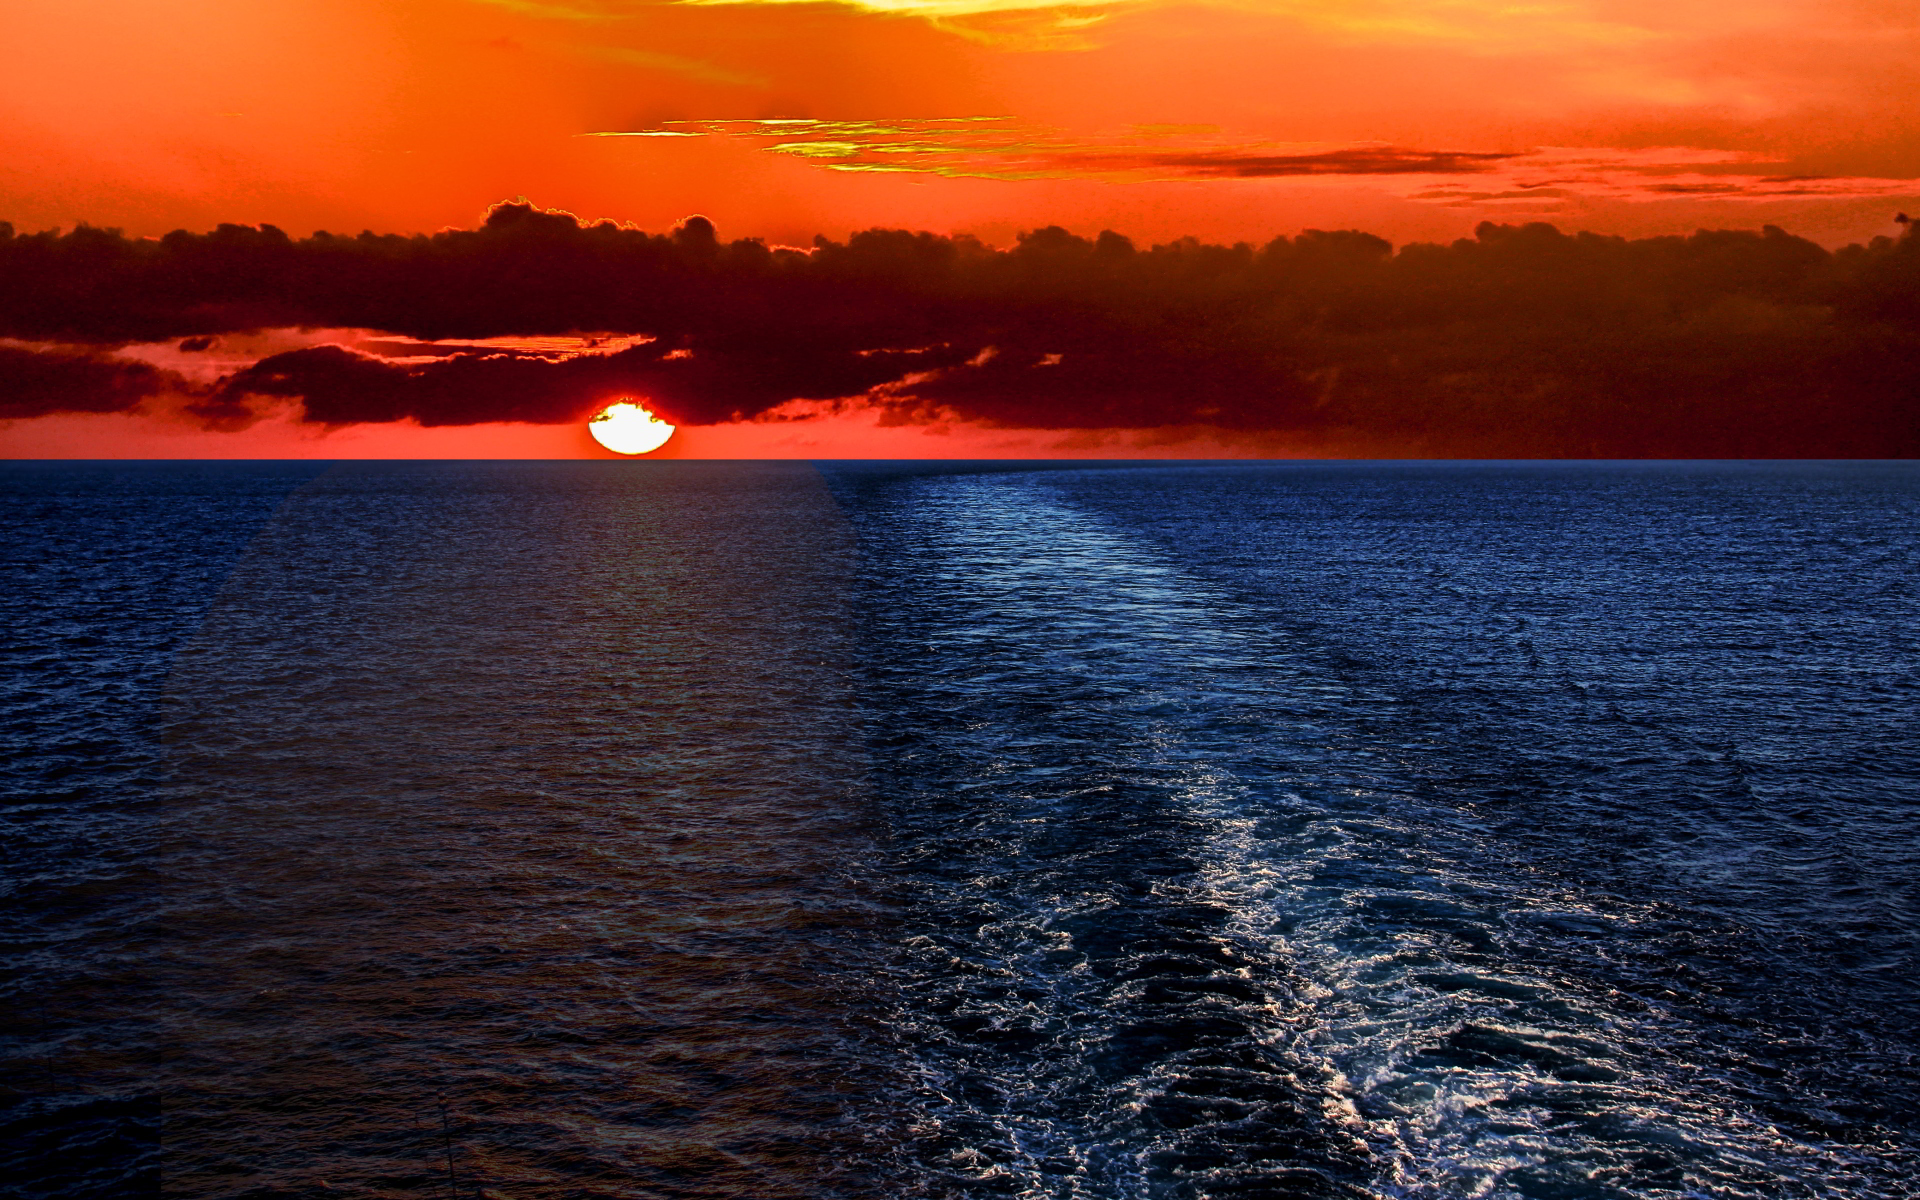 Ocean Scenery Wallpaper Sunset Ocean Scenery Wallpaper - Ocean Hd Wallpaper 1080p , HD Wallpaper & Backgrounds